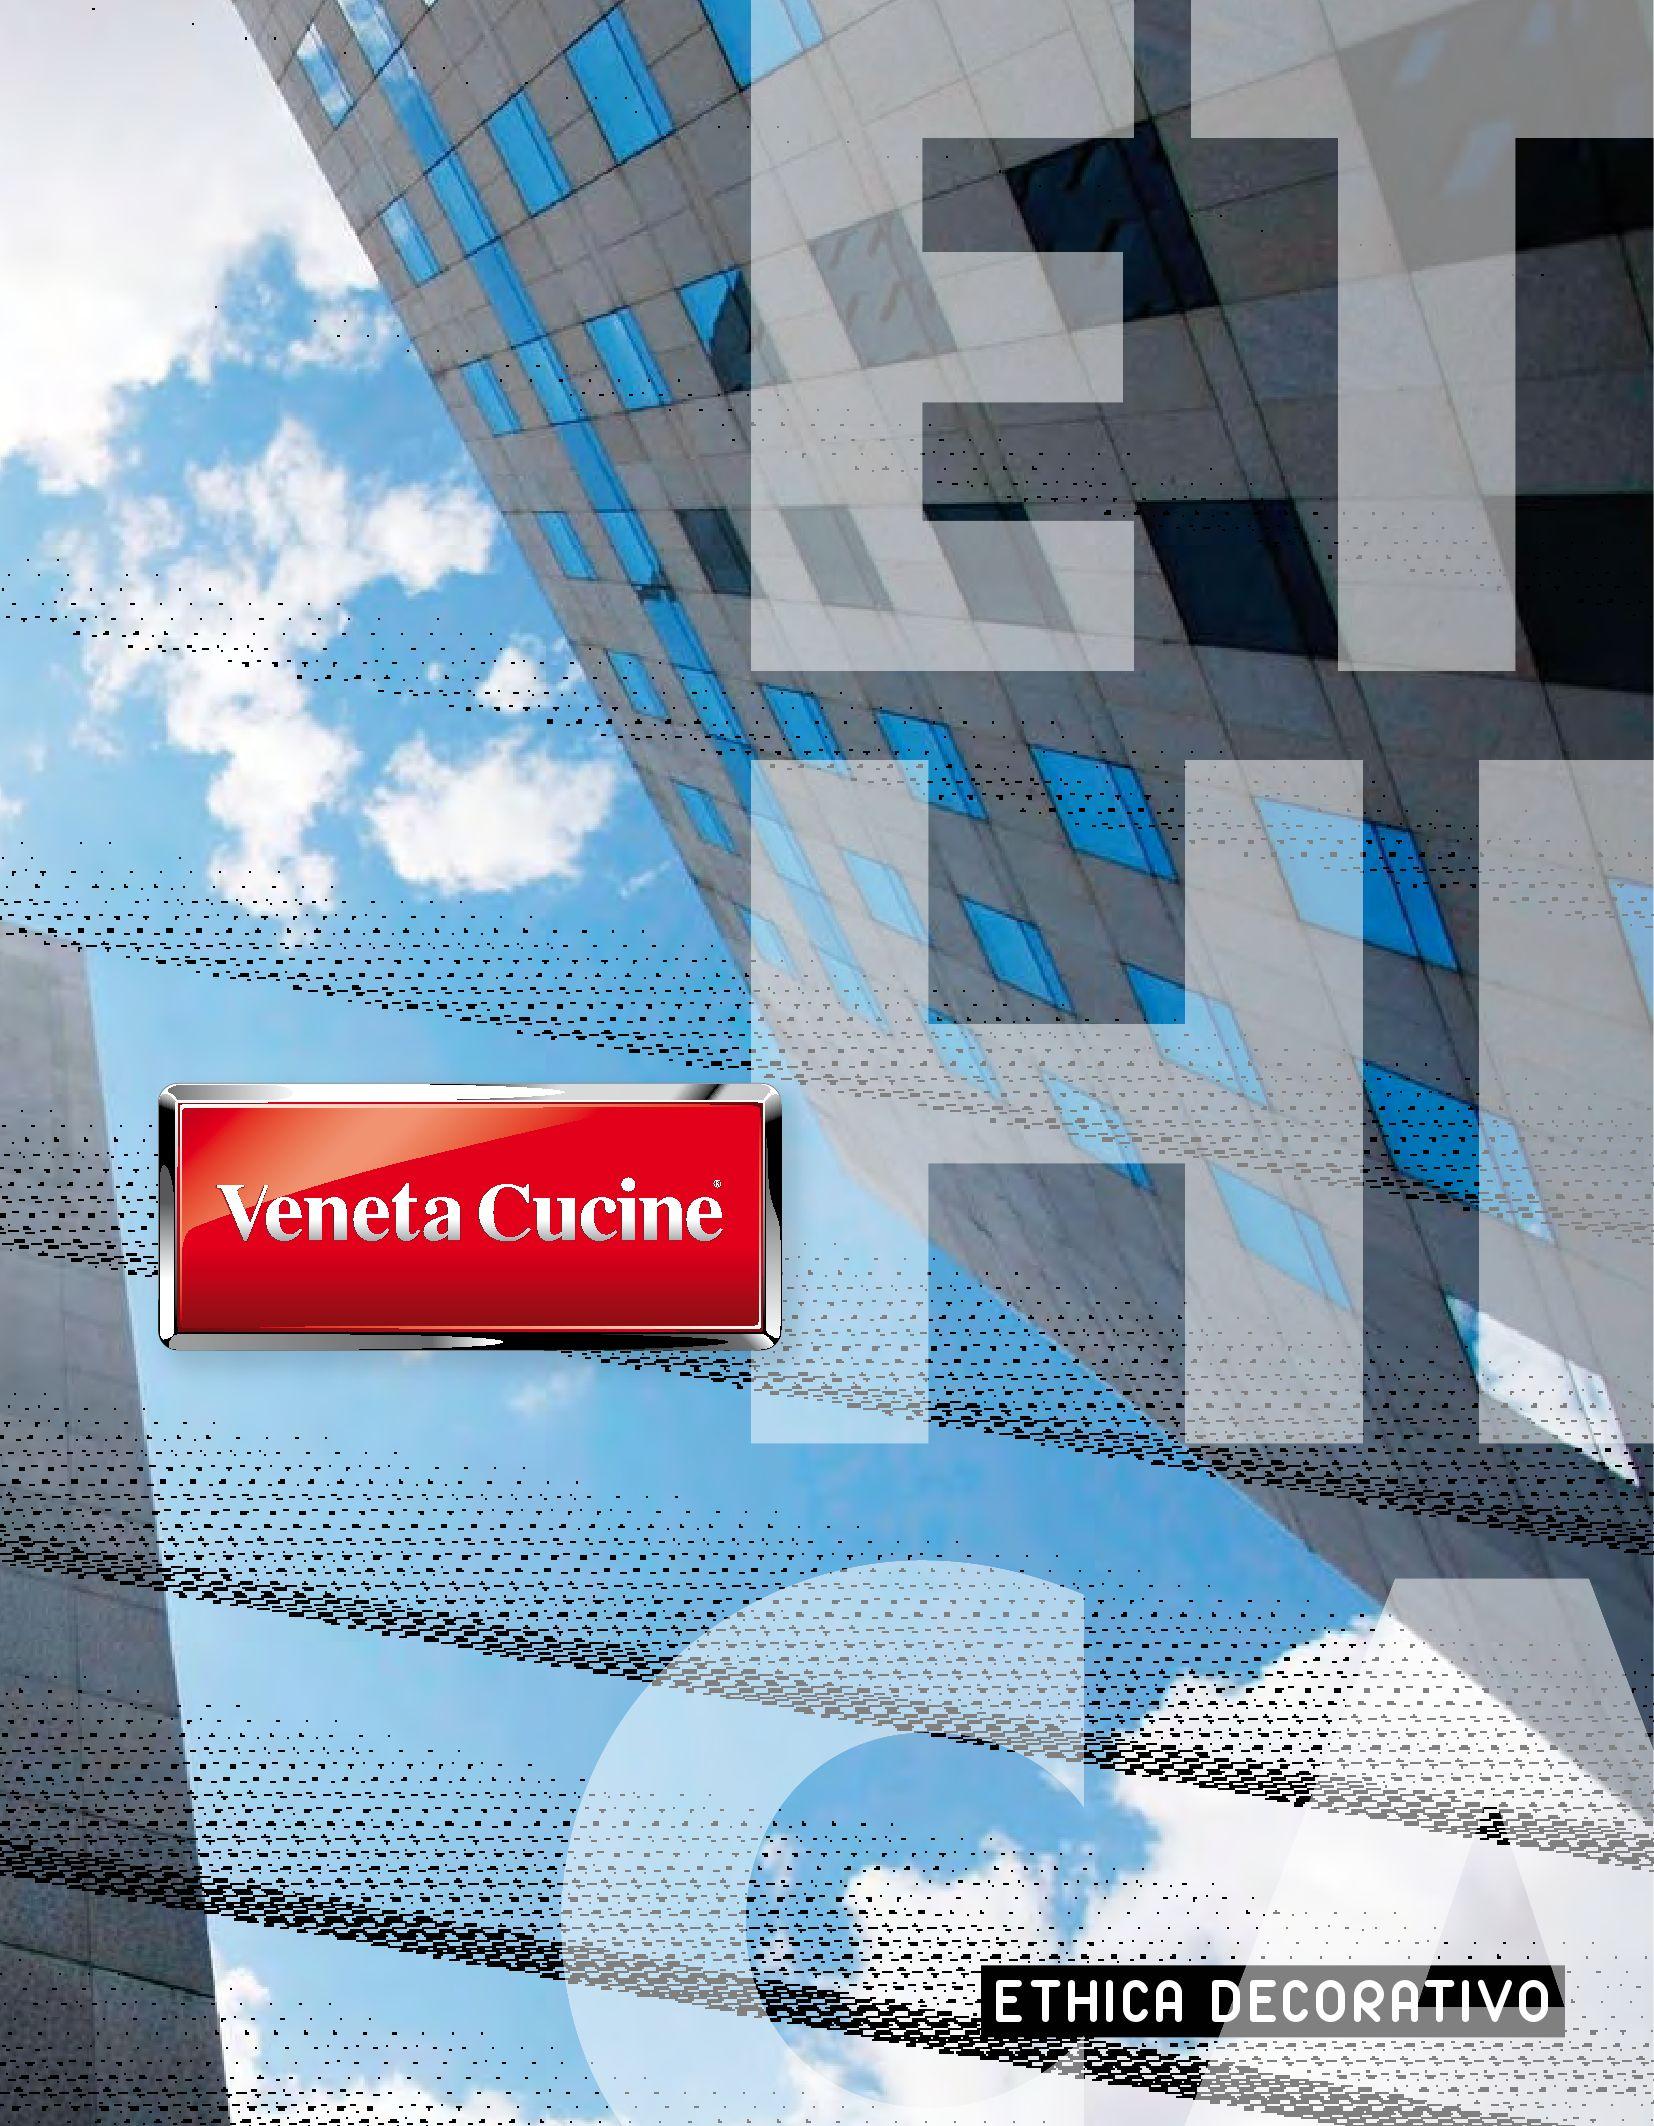 Catalogo Top Veneta Cucine.Catalogo Veneta Cucine Ethica Decorativo By 1216 Mobiliaris Issuu